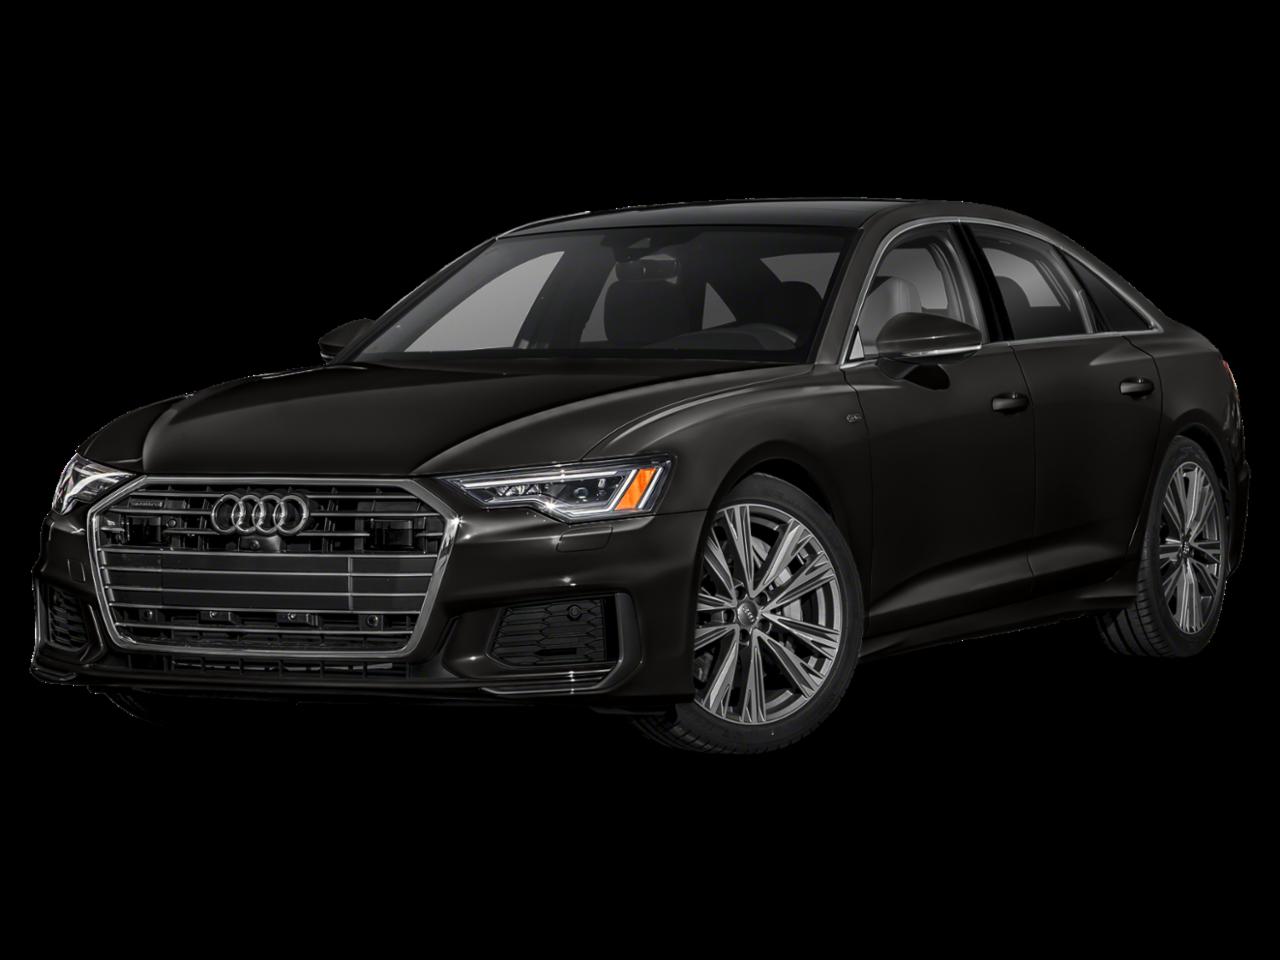 Audi 2020 A6 Prestige